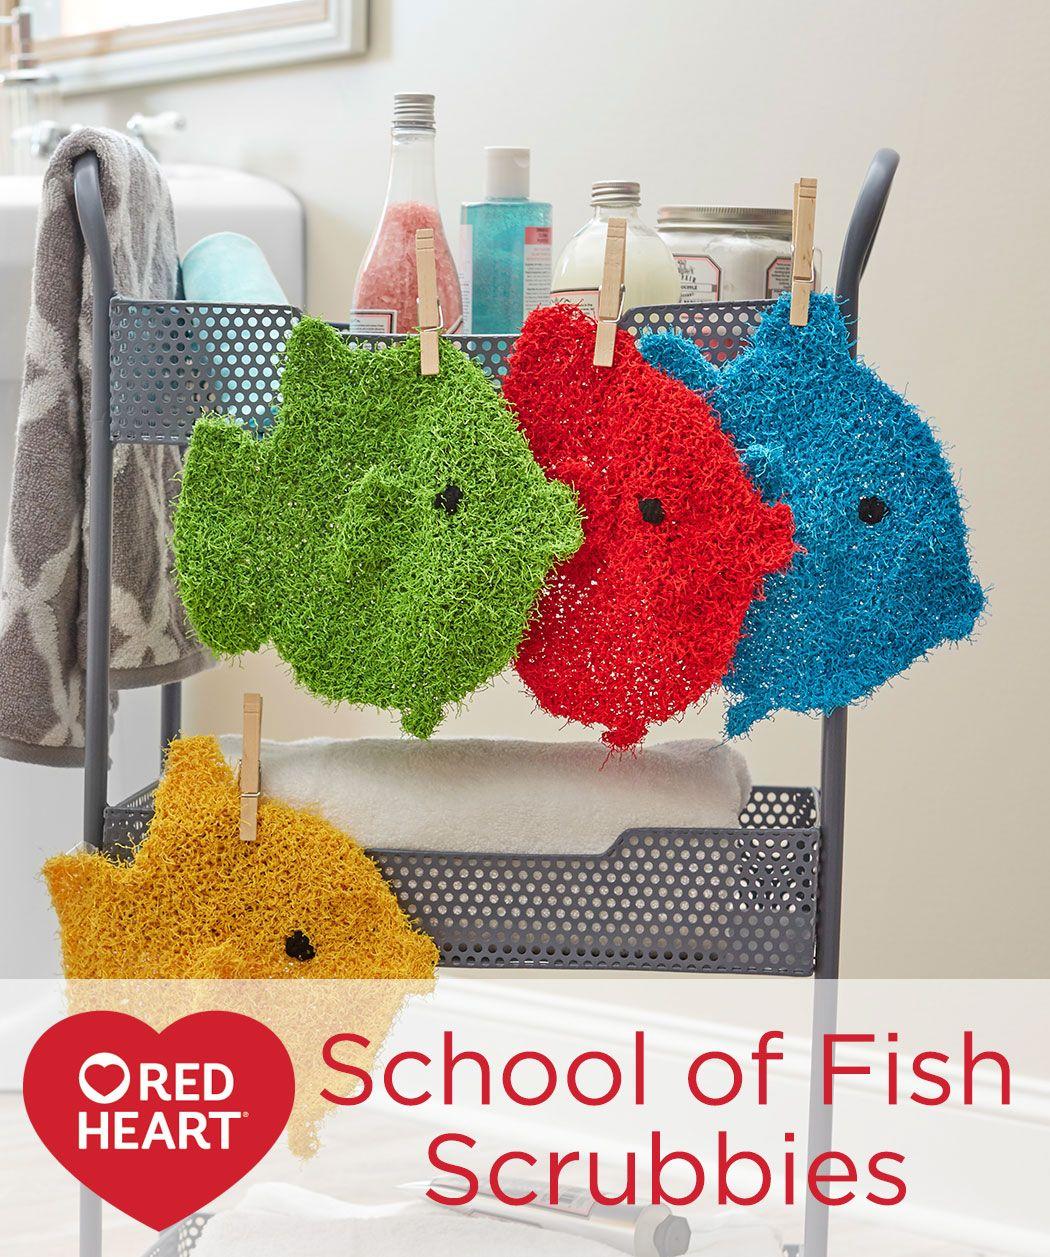 School of Fish Scrubbies Free Knitting Pattern in Red Heart yarns ...